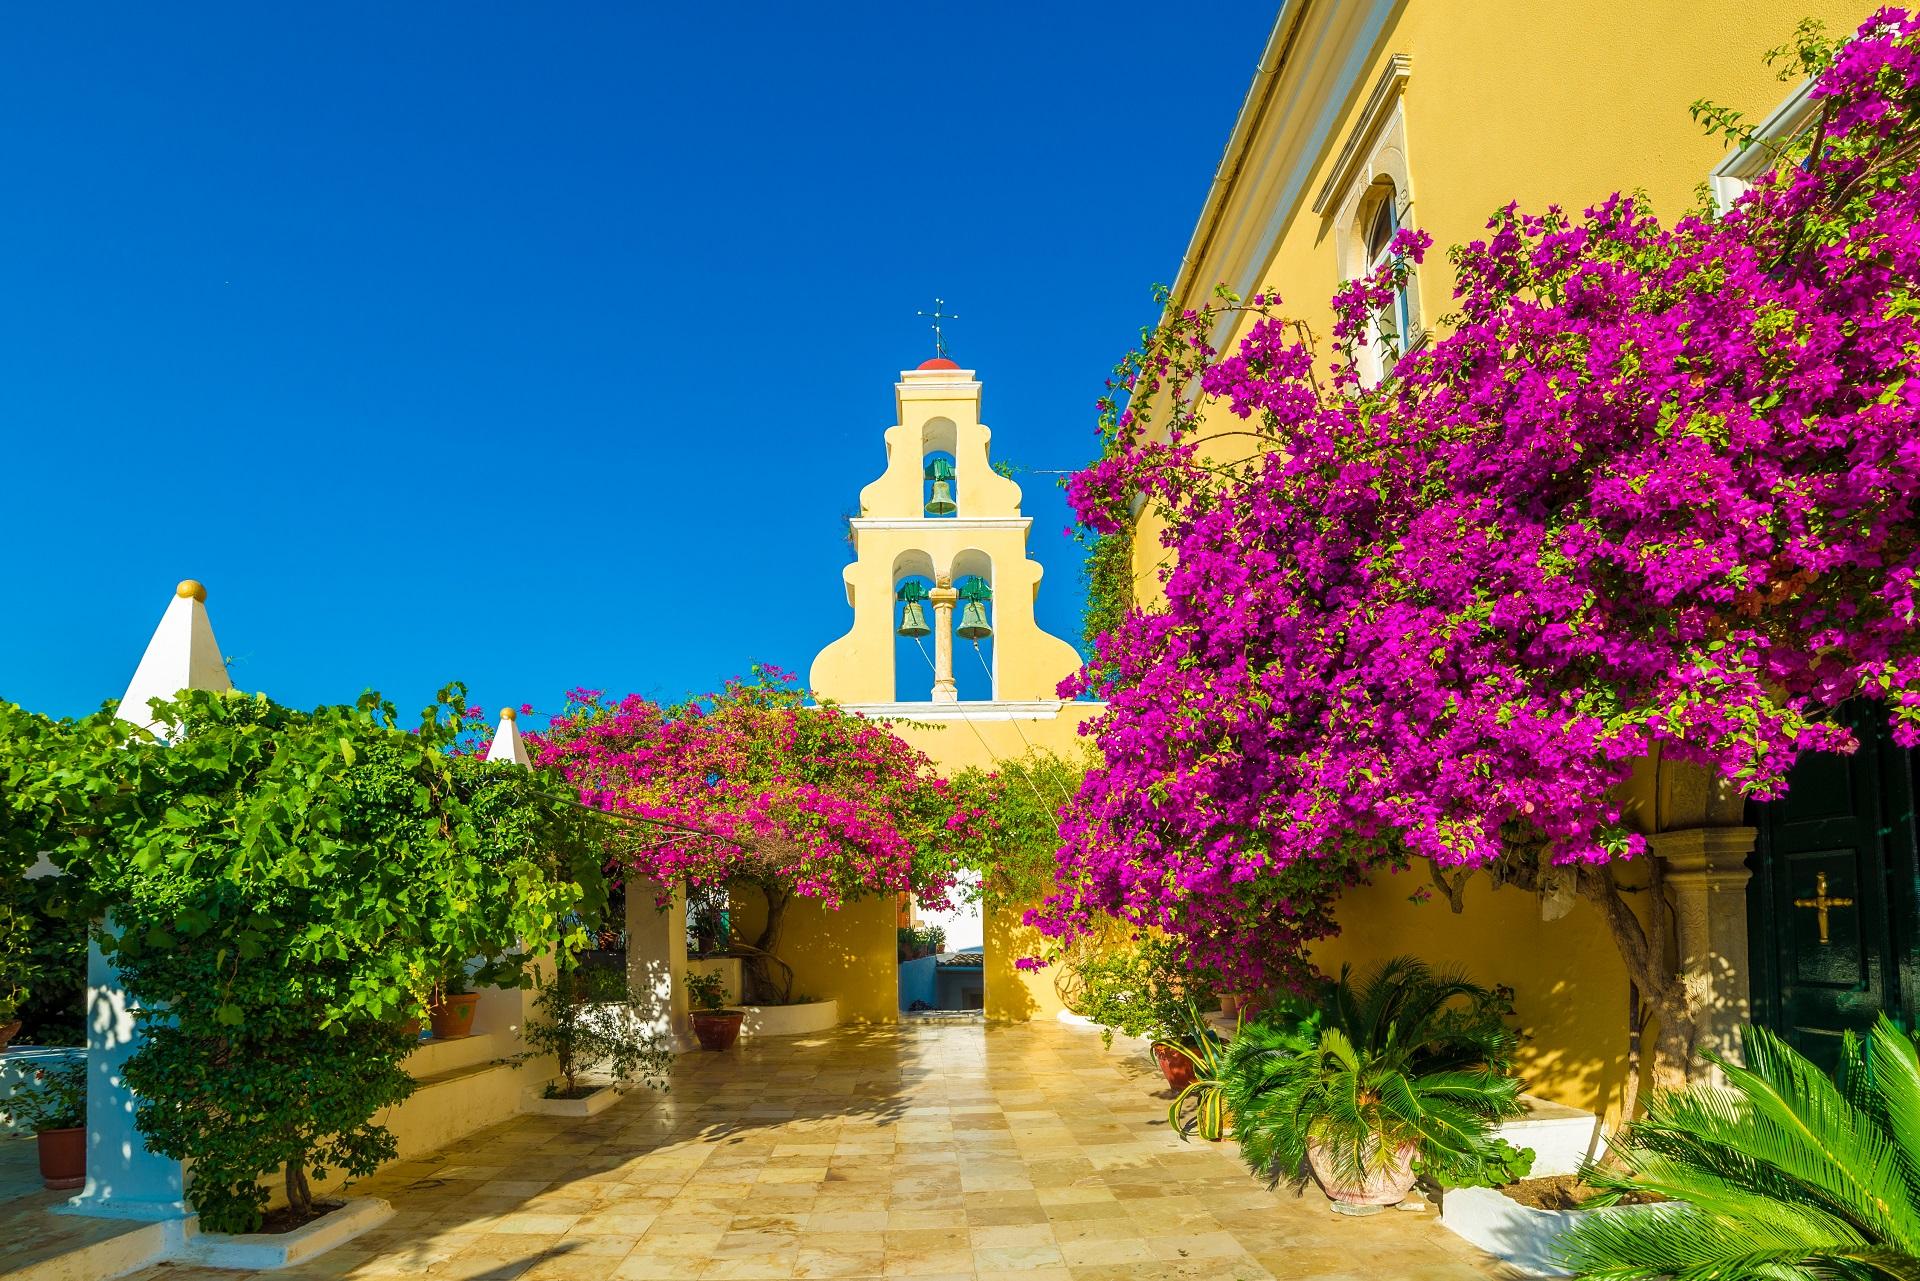 Kloster Panagía Theotóku tis Paleokastrítsas auf Korfu, Griechenland